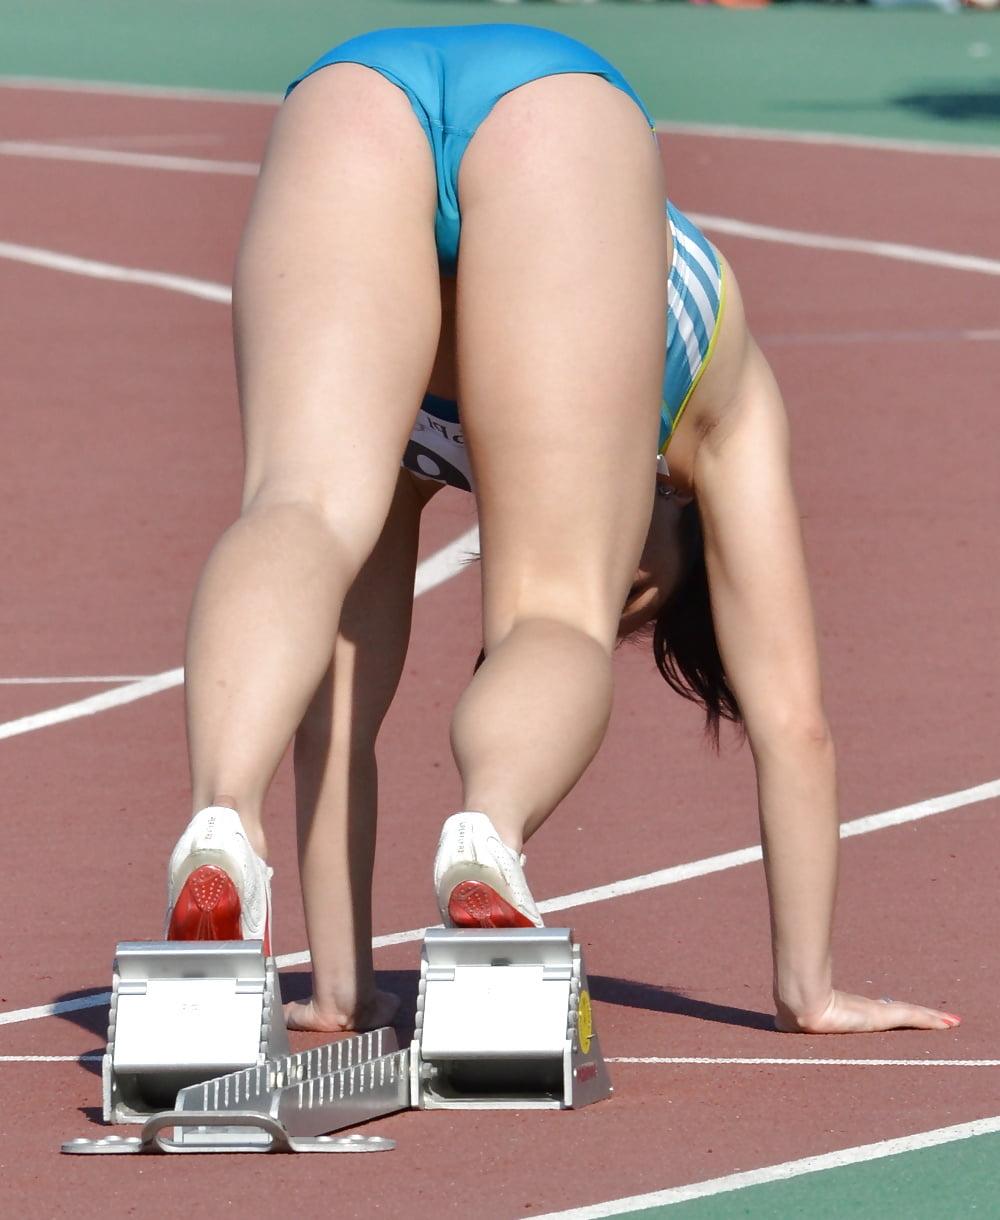 Шлюхи фото засветы писек спортсменов смотреть онлайн сперма эро фото